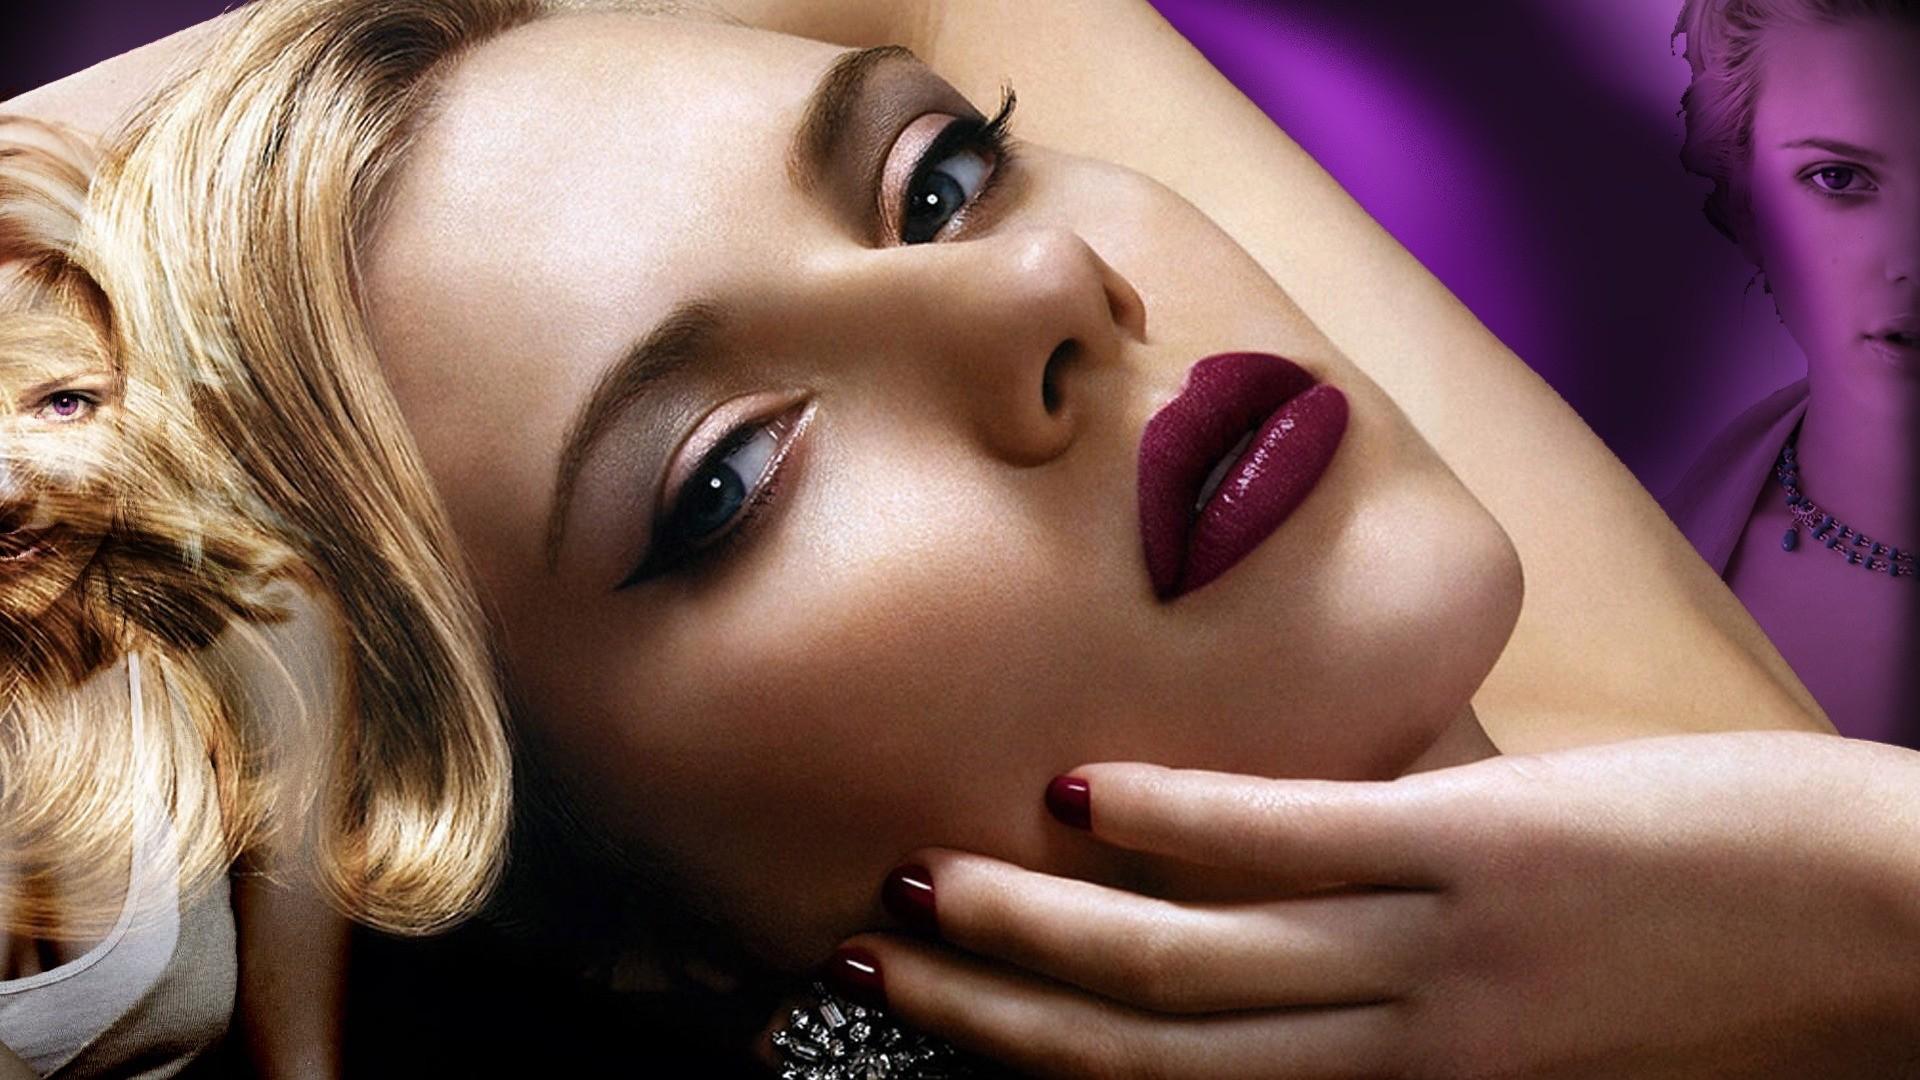 Scarlett Johansson full wallpaper